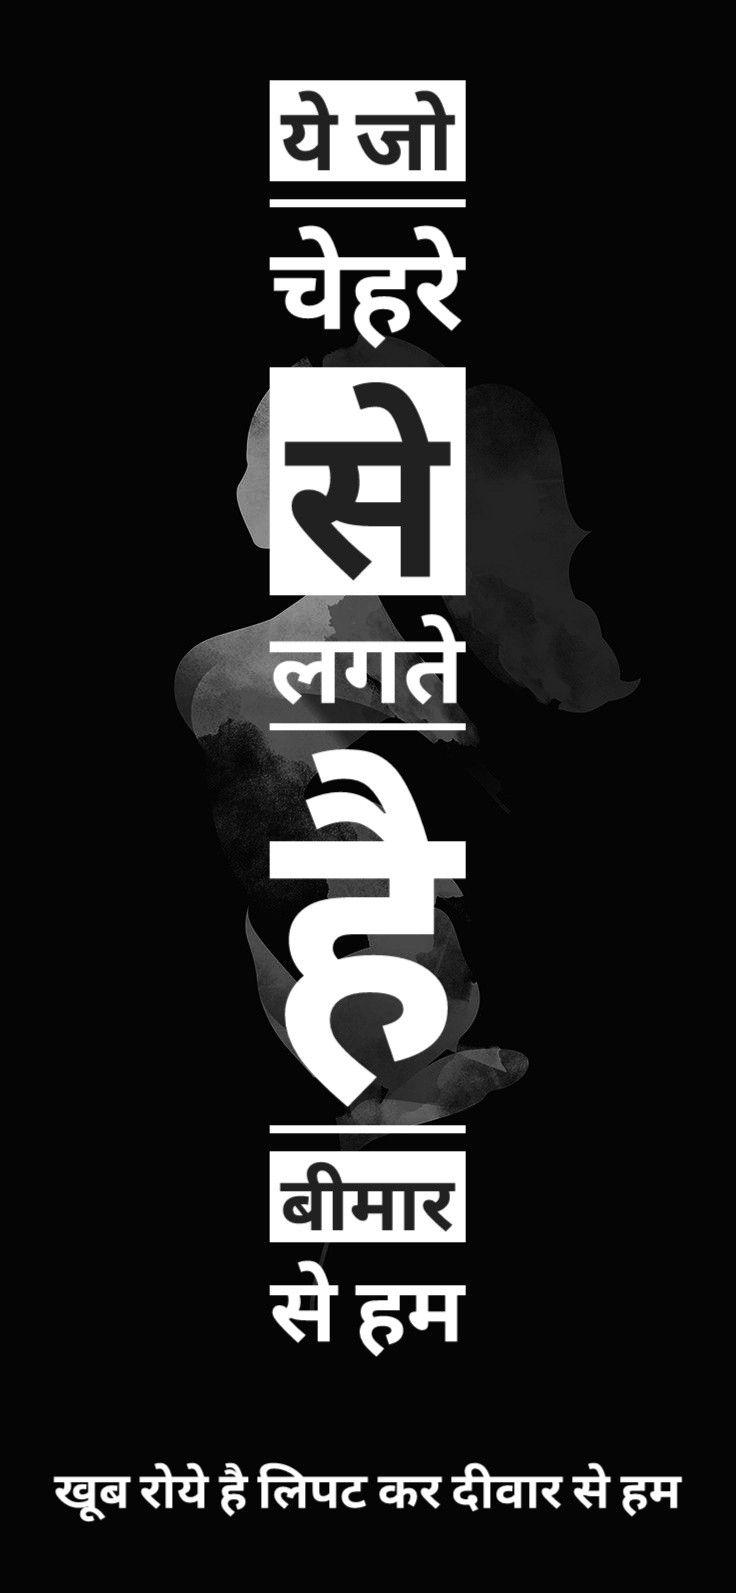 Pin By Shrushti Raval On Mai Phir Bhi Tumko Chahunga Quotes Deep Weird Words Music Quotes